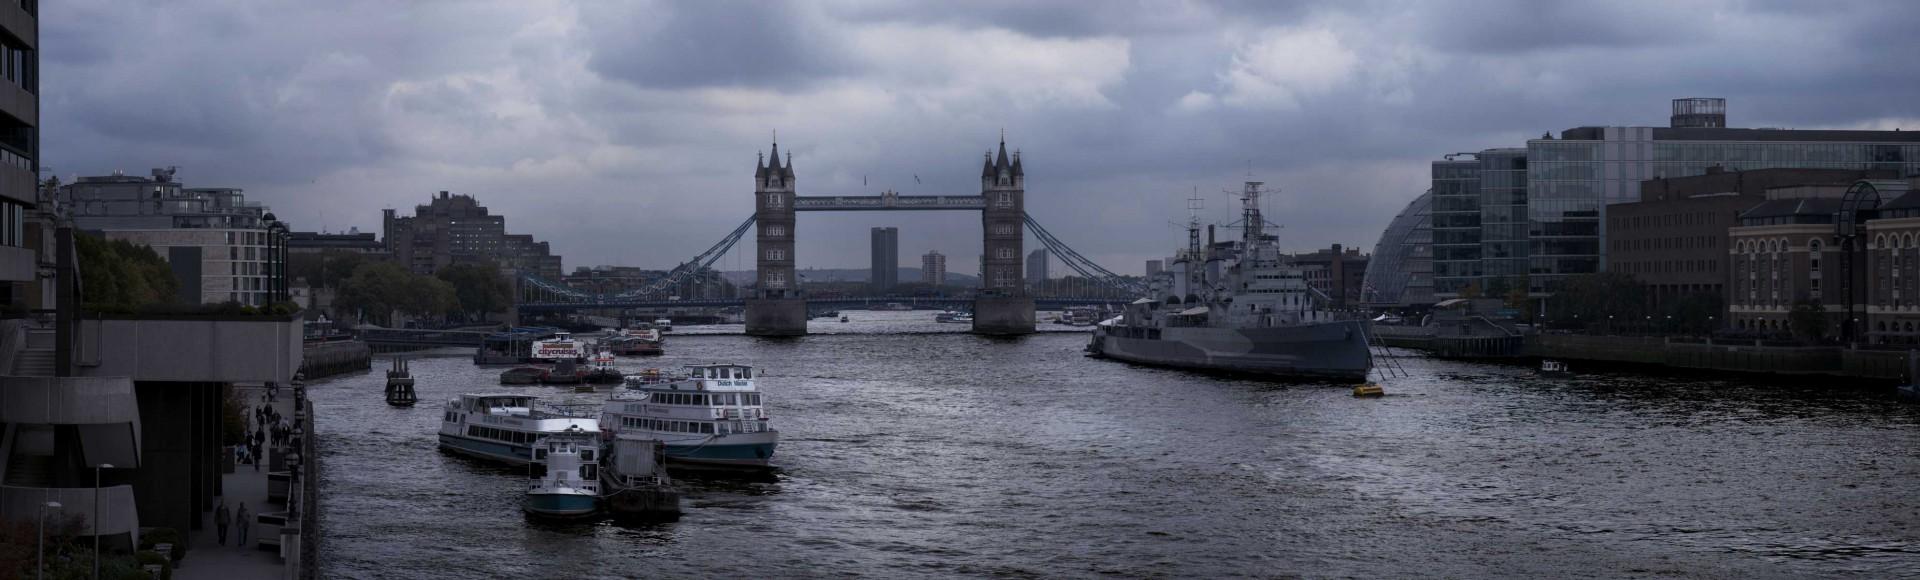 Michele Settembre Fotografia Londra London Tower Bridge